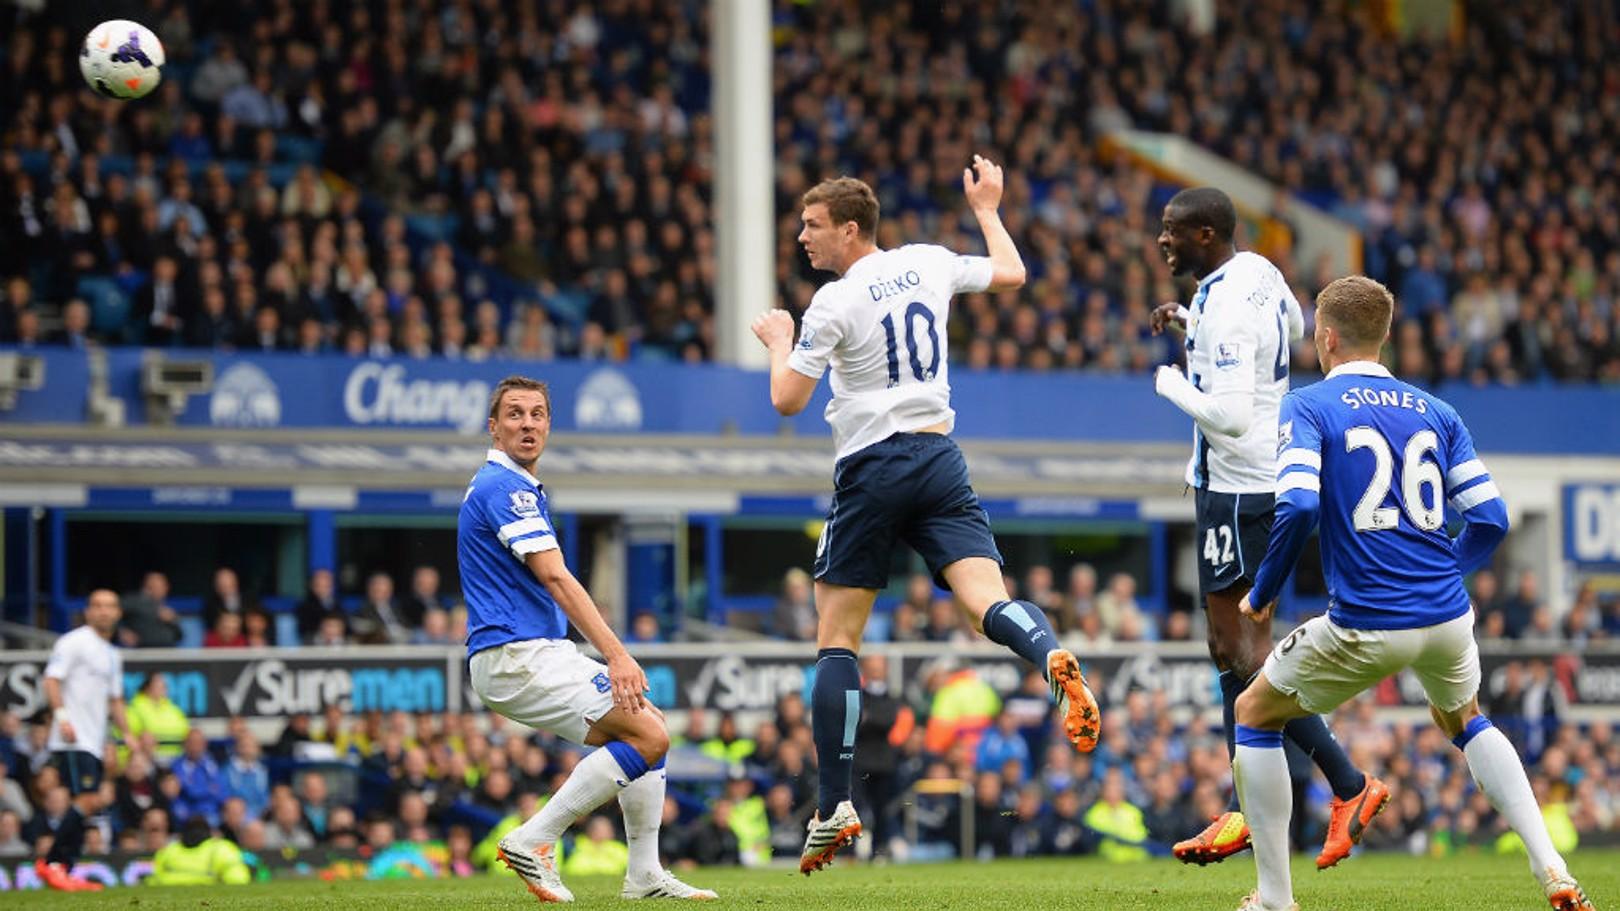 MATCH-WINNER: Edin Dzeko nets a crucial strike against Everton in the 2014 title run-in.